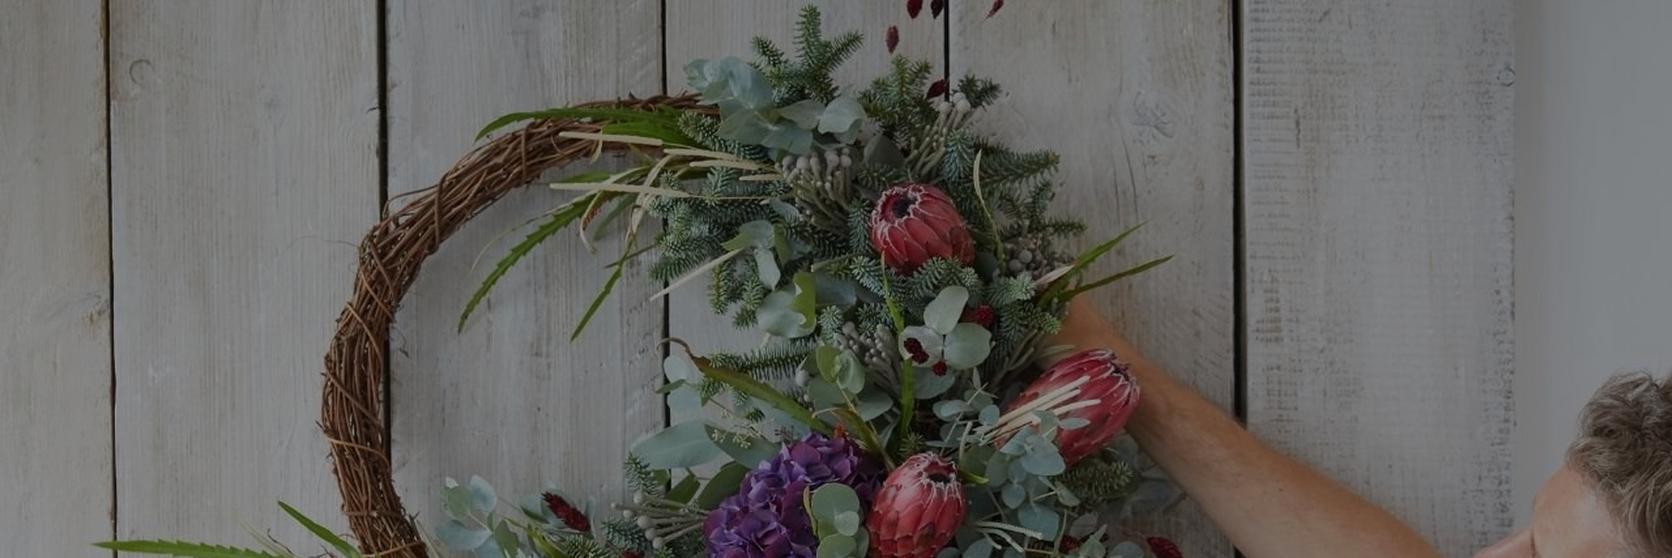 Steve-Betts-Wreath-artisan